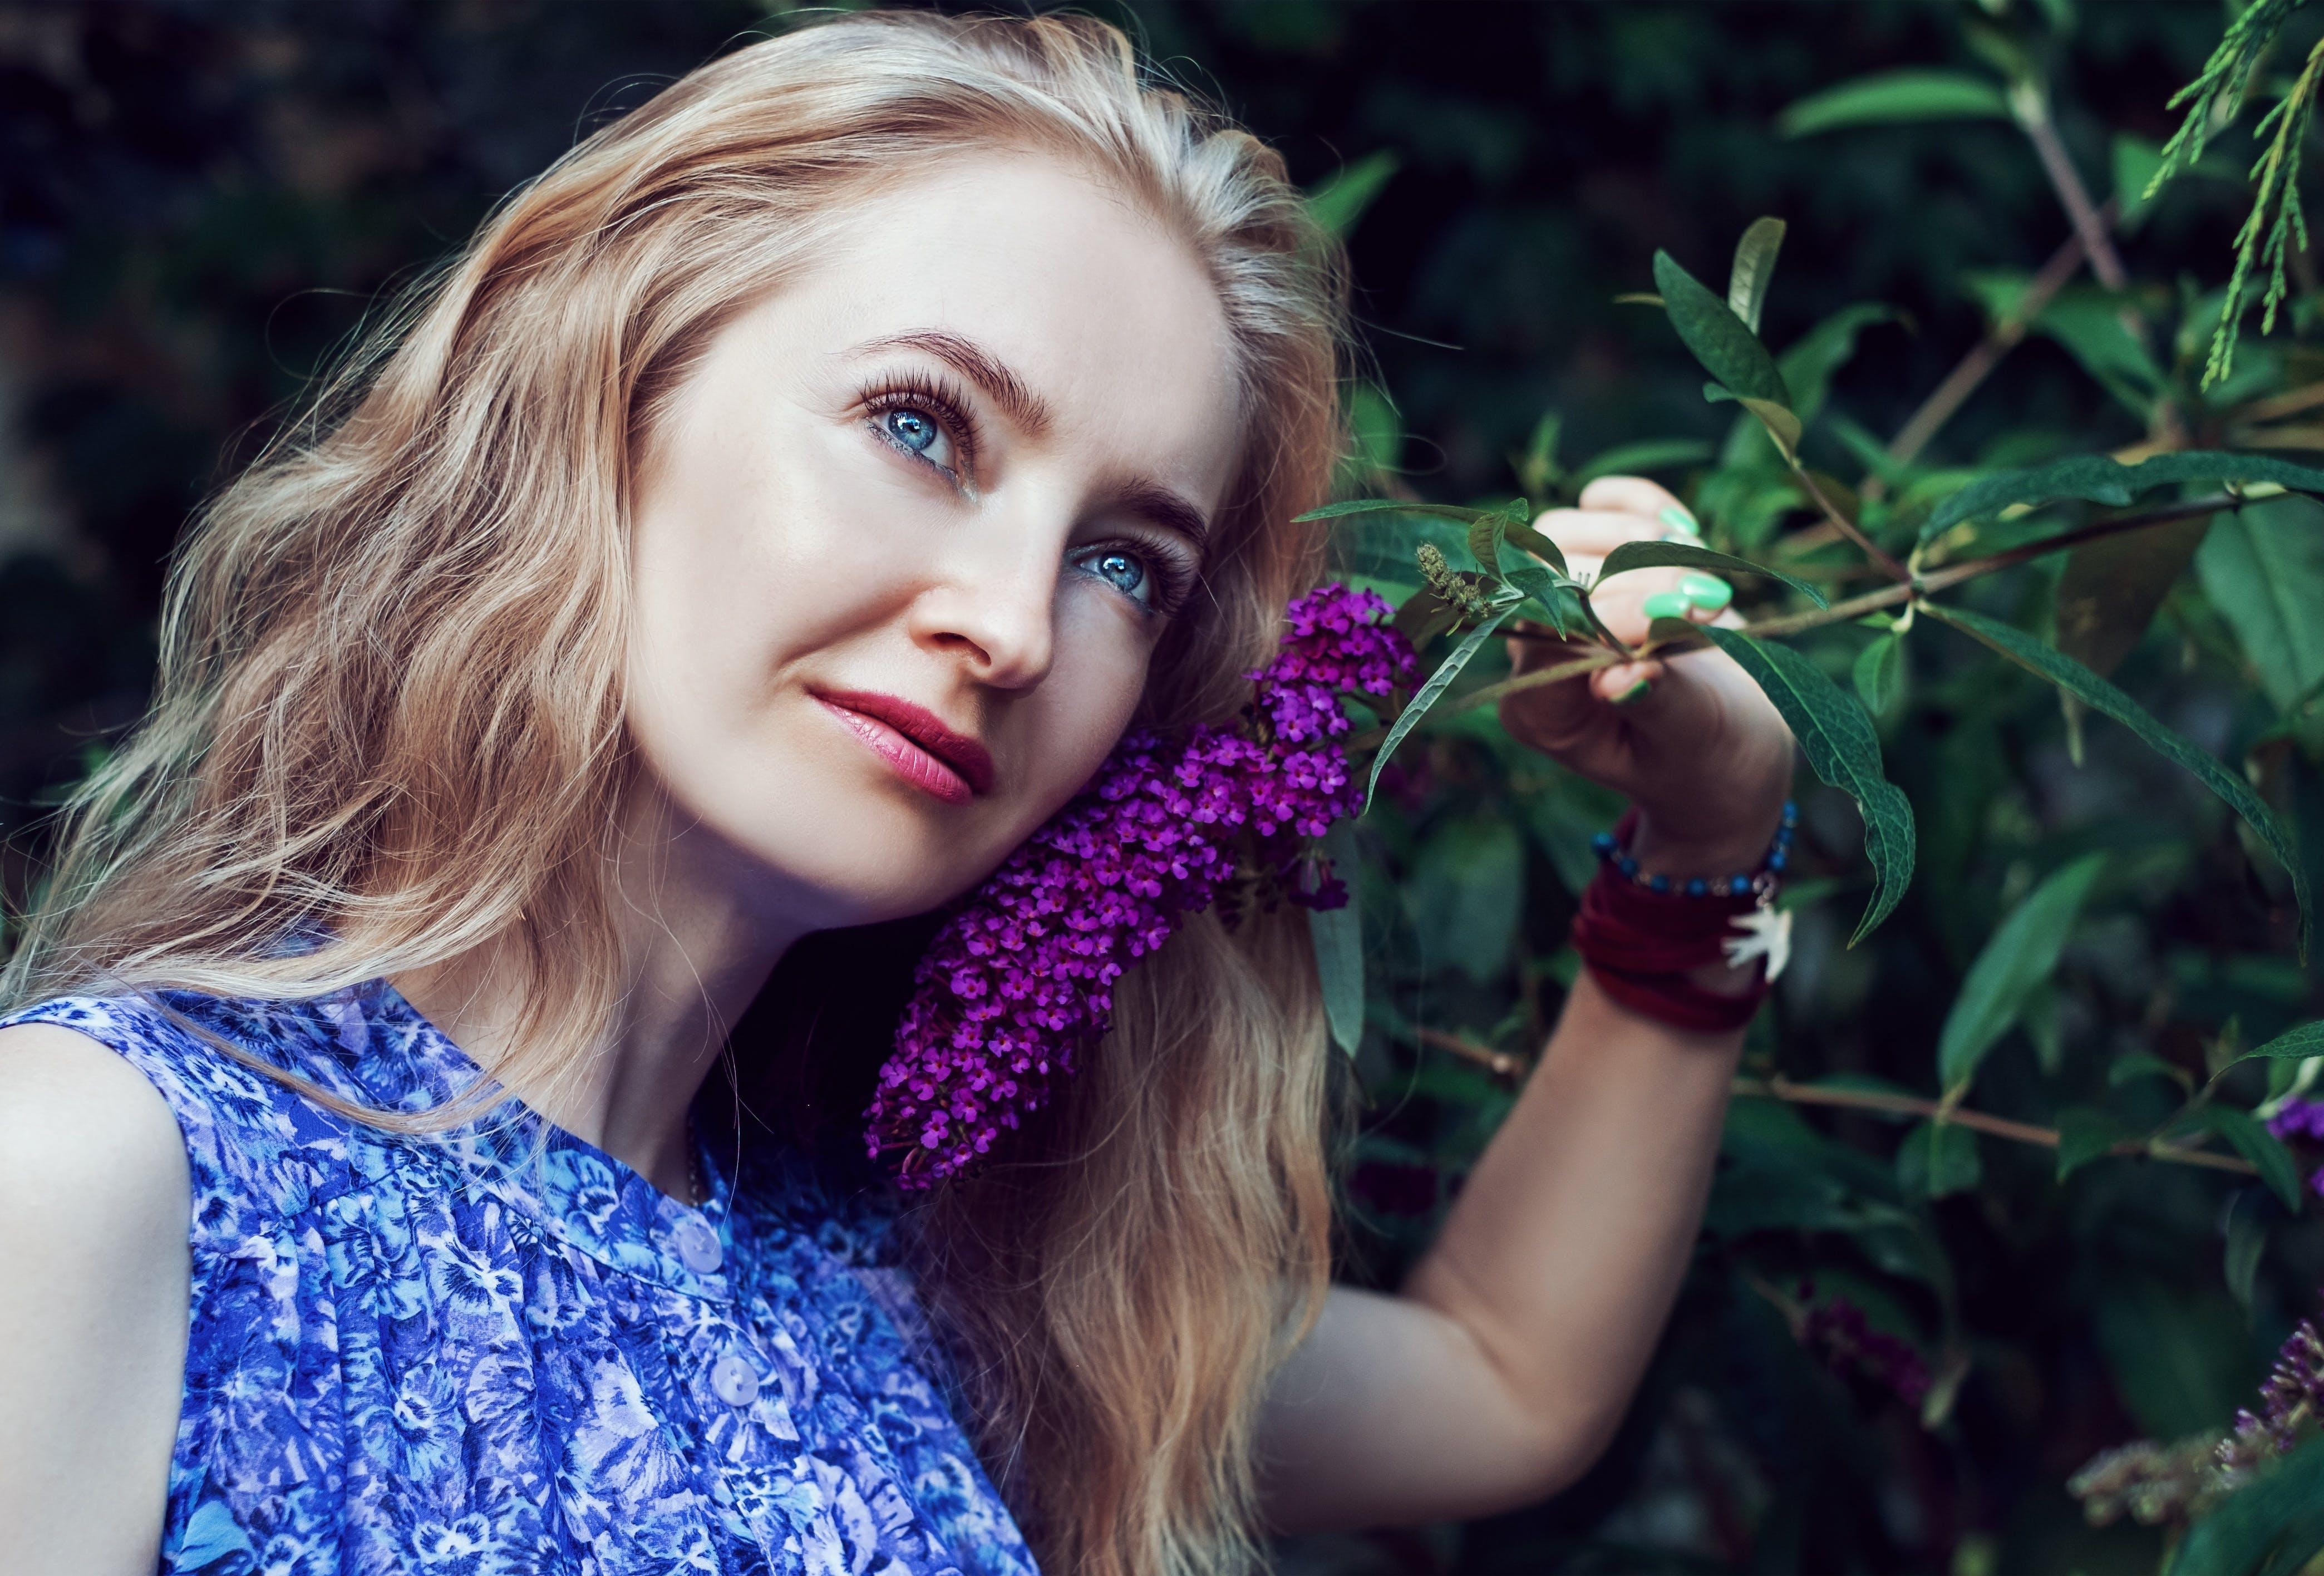 Woman Wearing Blue Floral Sleeveless Dress Smelling Violet Flower